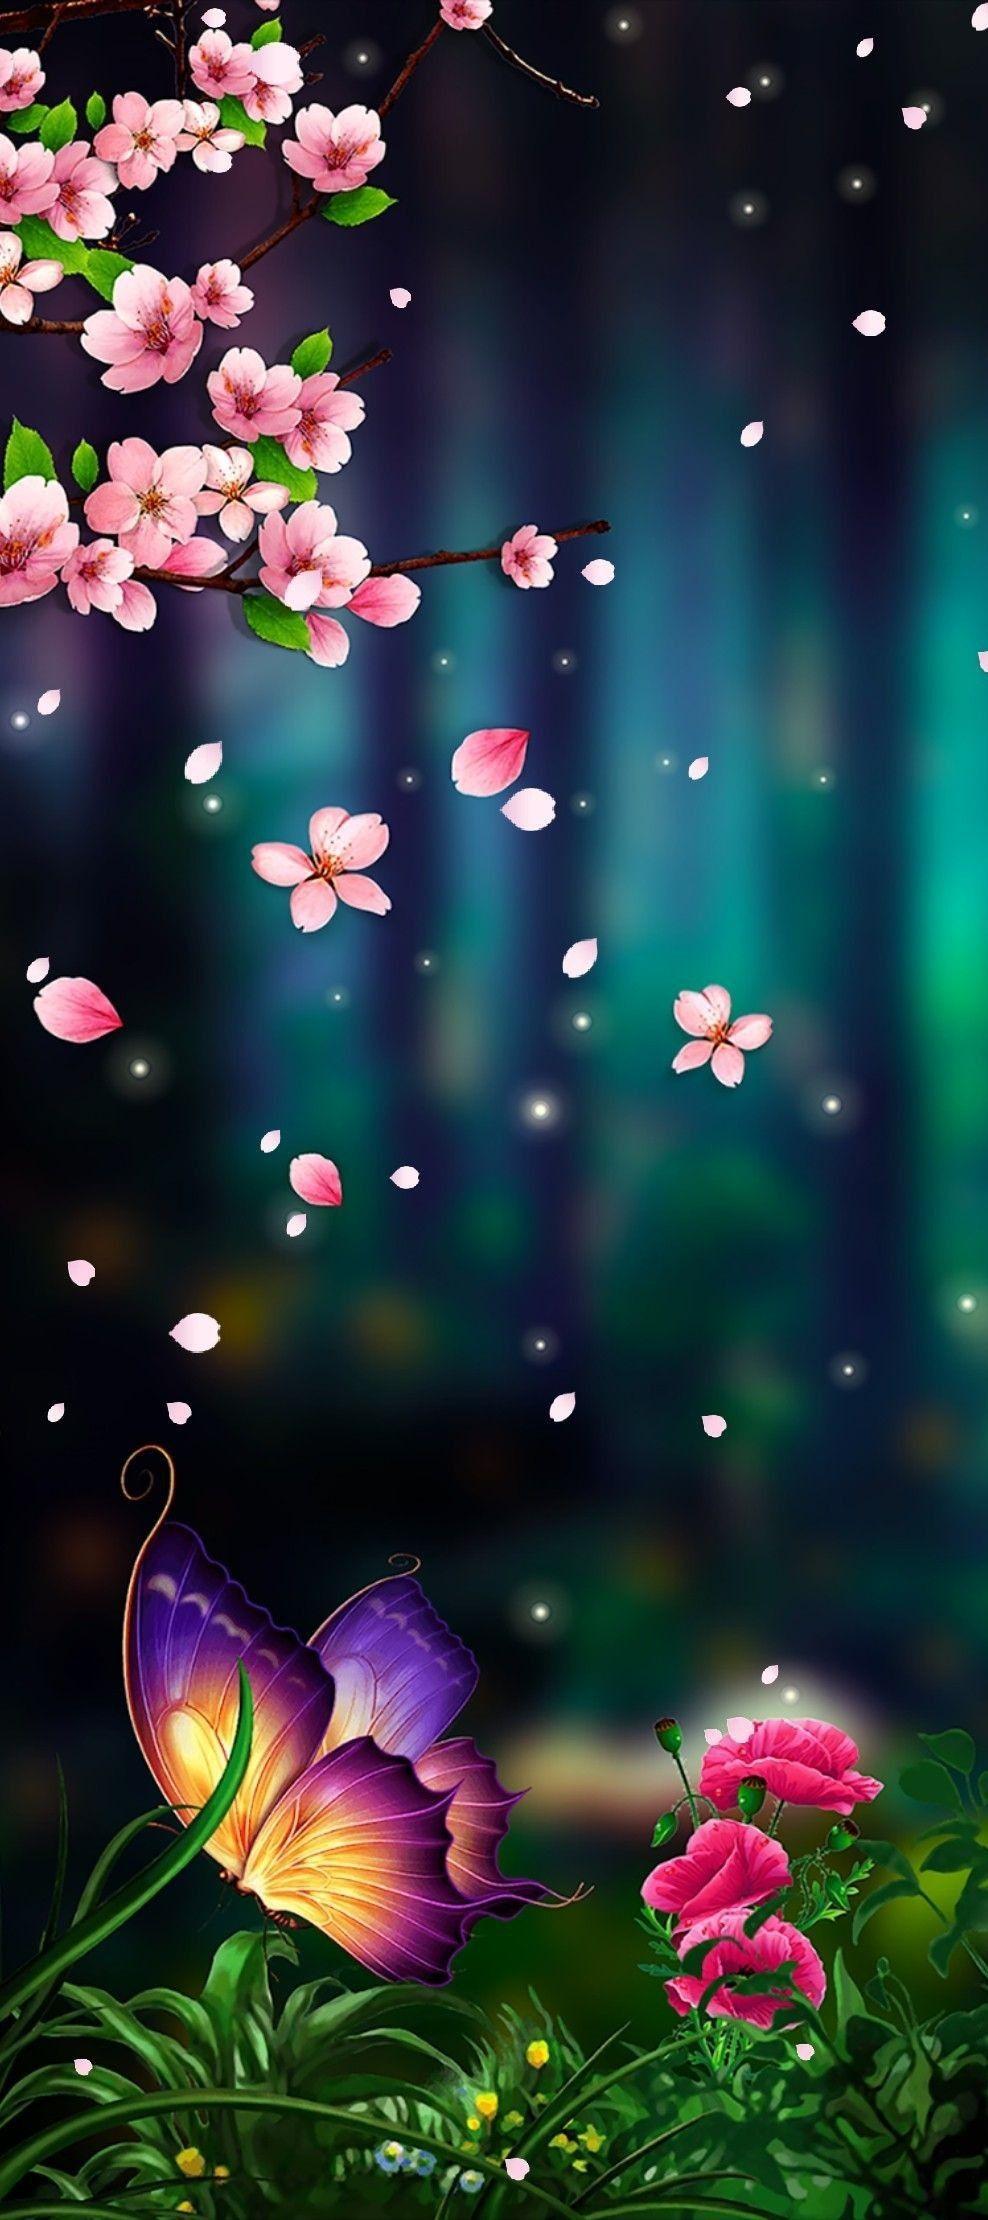 Telefon Duvar Kagitlari Galaxy Wallpaper Kelebekler Fraktal Sanati